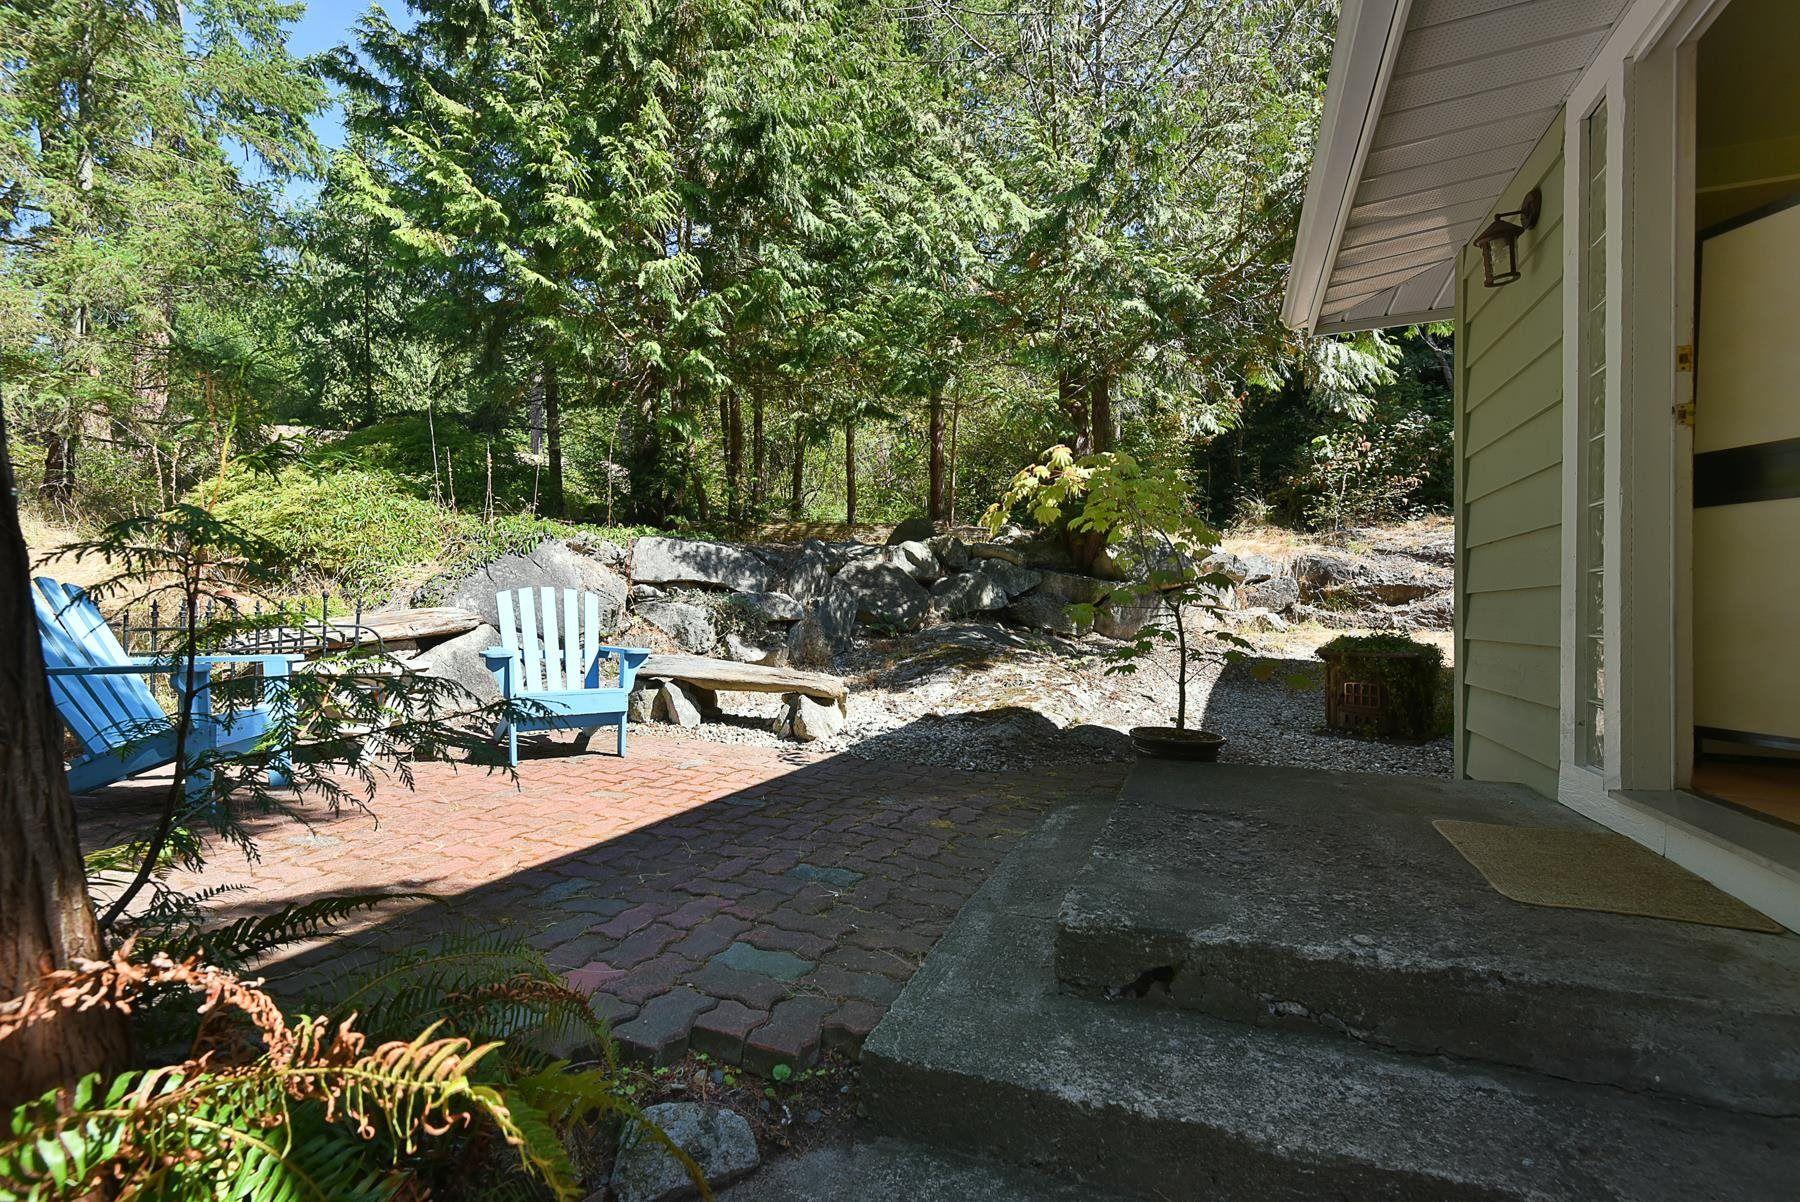 Main Photo: 1142 ROBERTS CREEK Road: Roberts Creek House for sale (Sunshine Coast)  : MLS®# R2612861